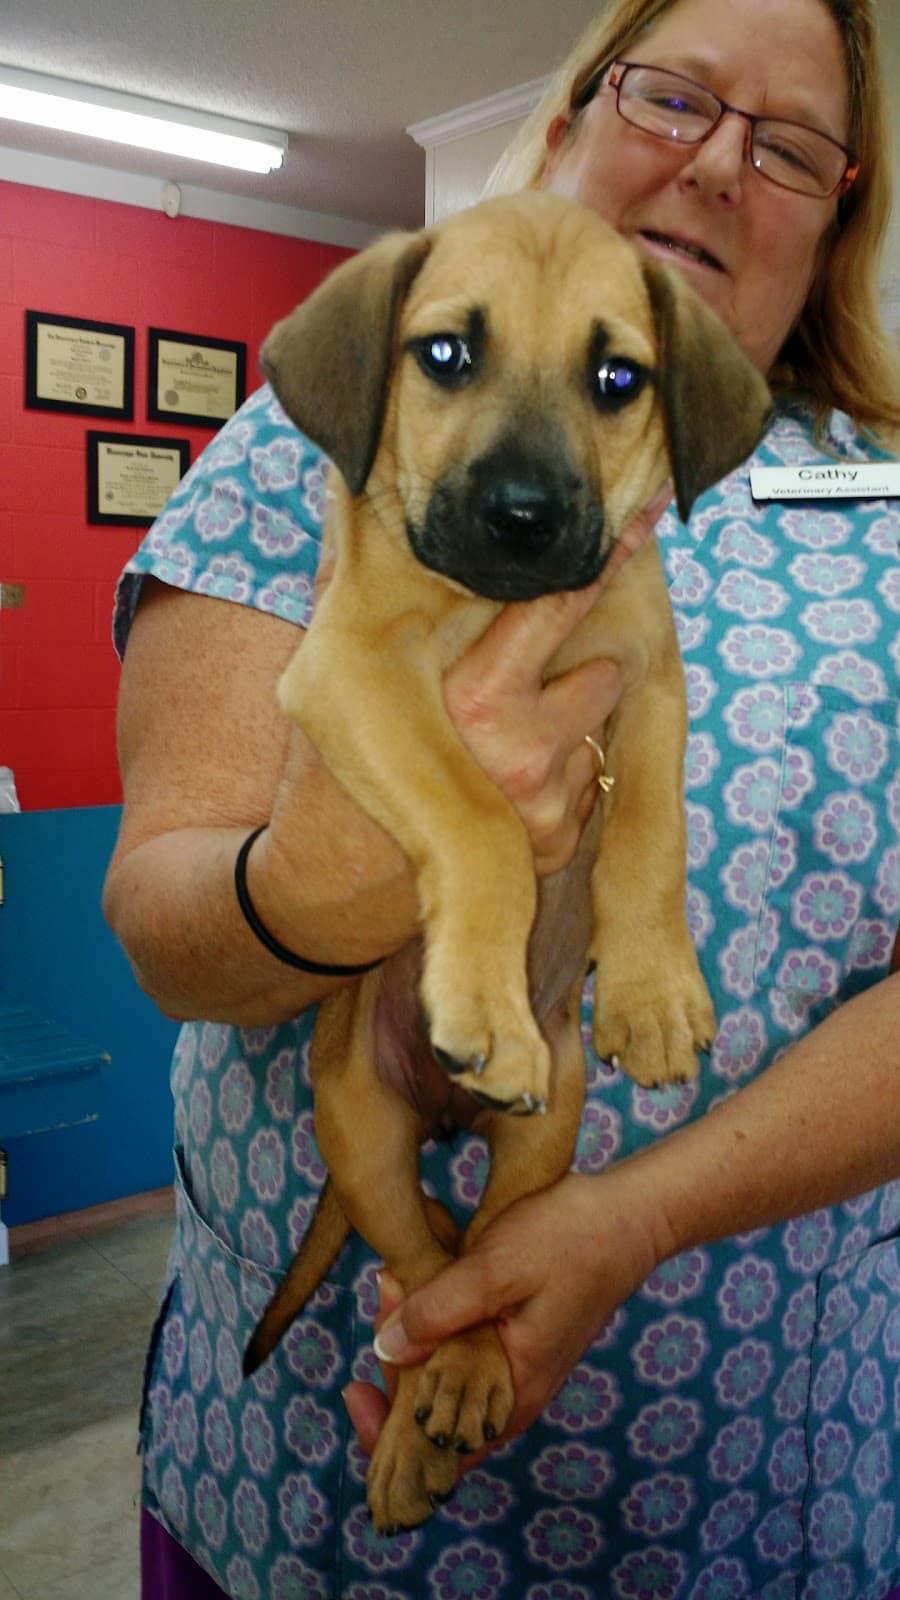 Airport Veterinary Clinic: Ratcliff Misha DVM